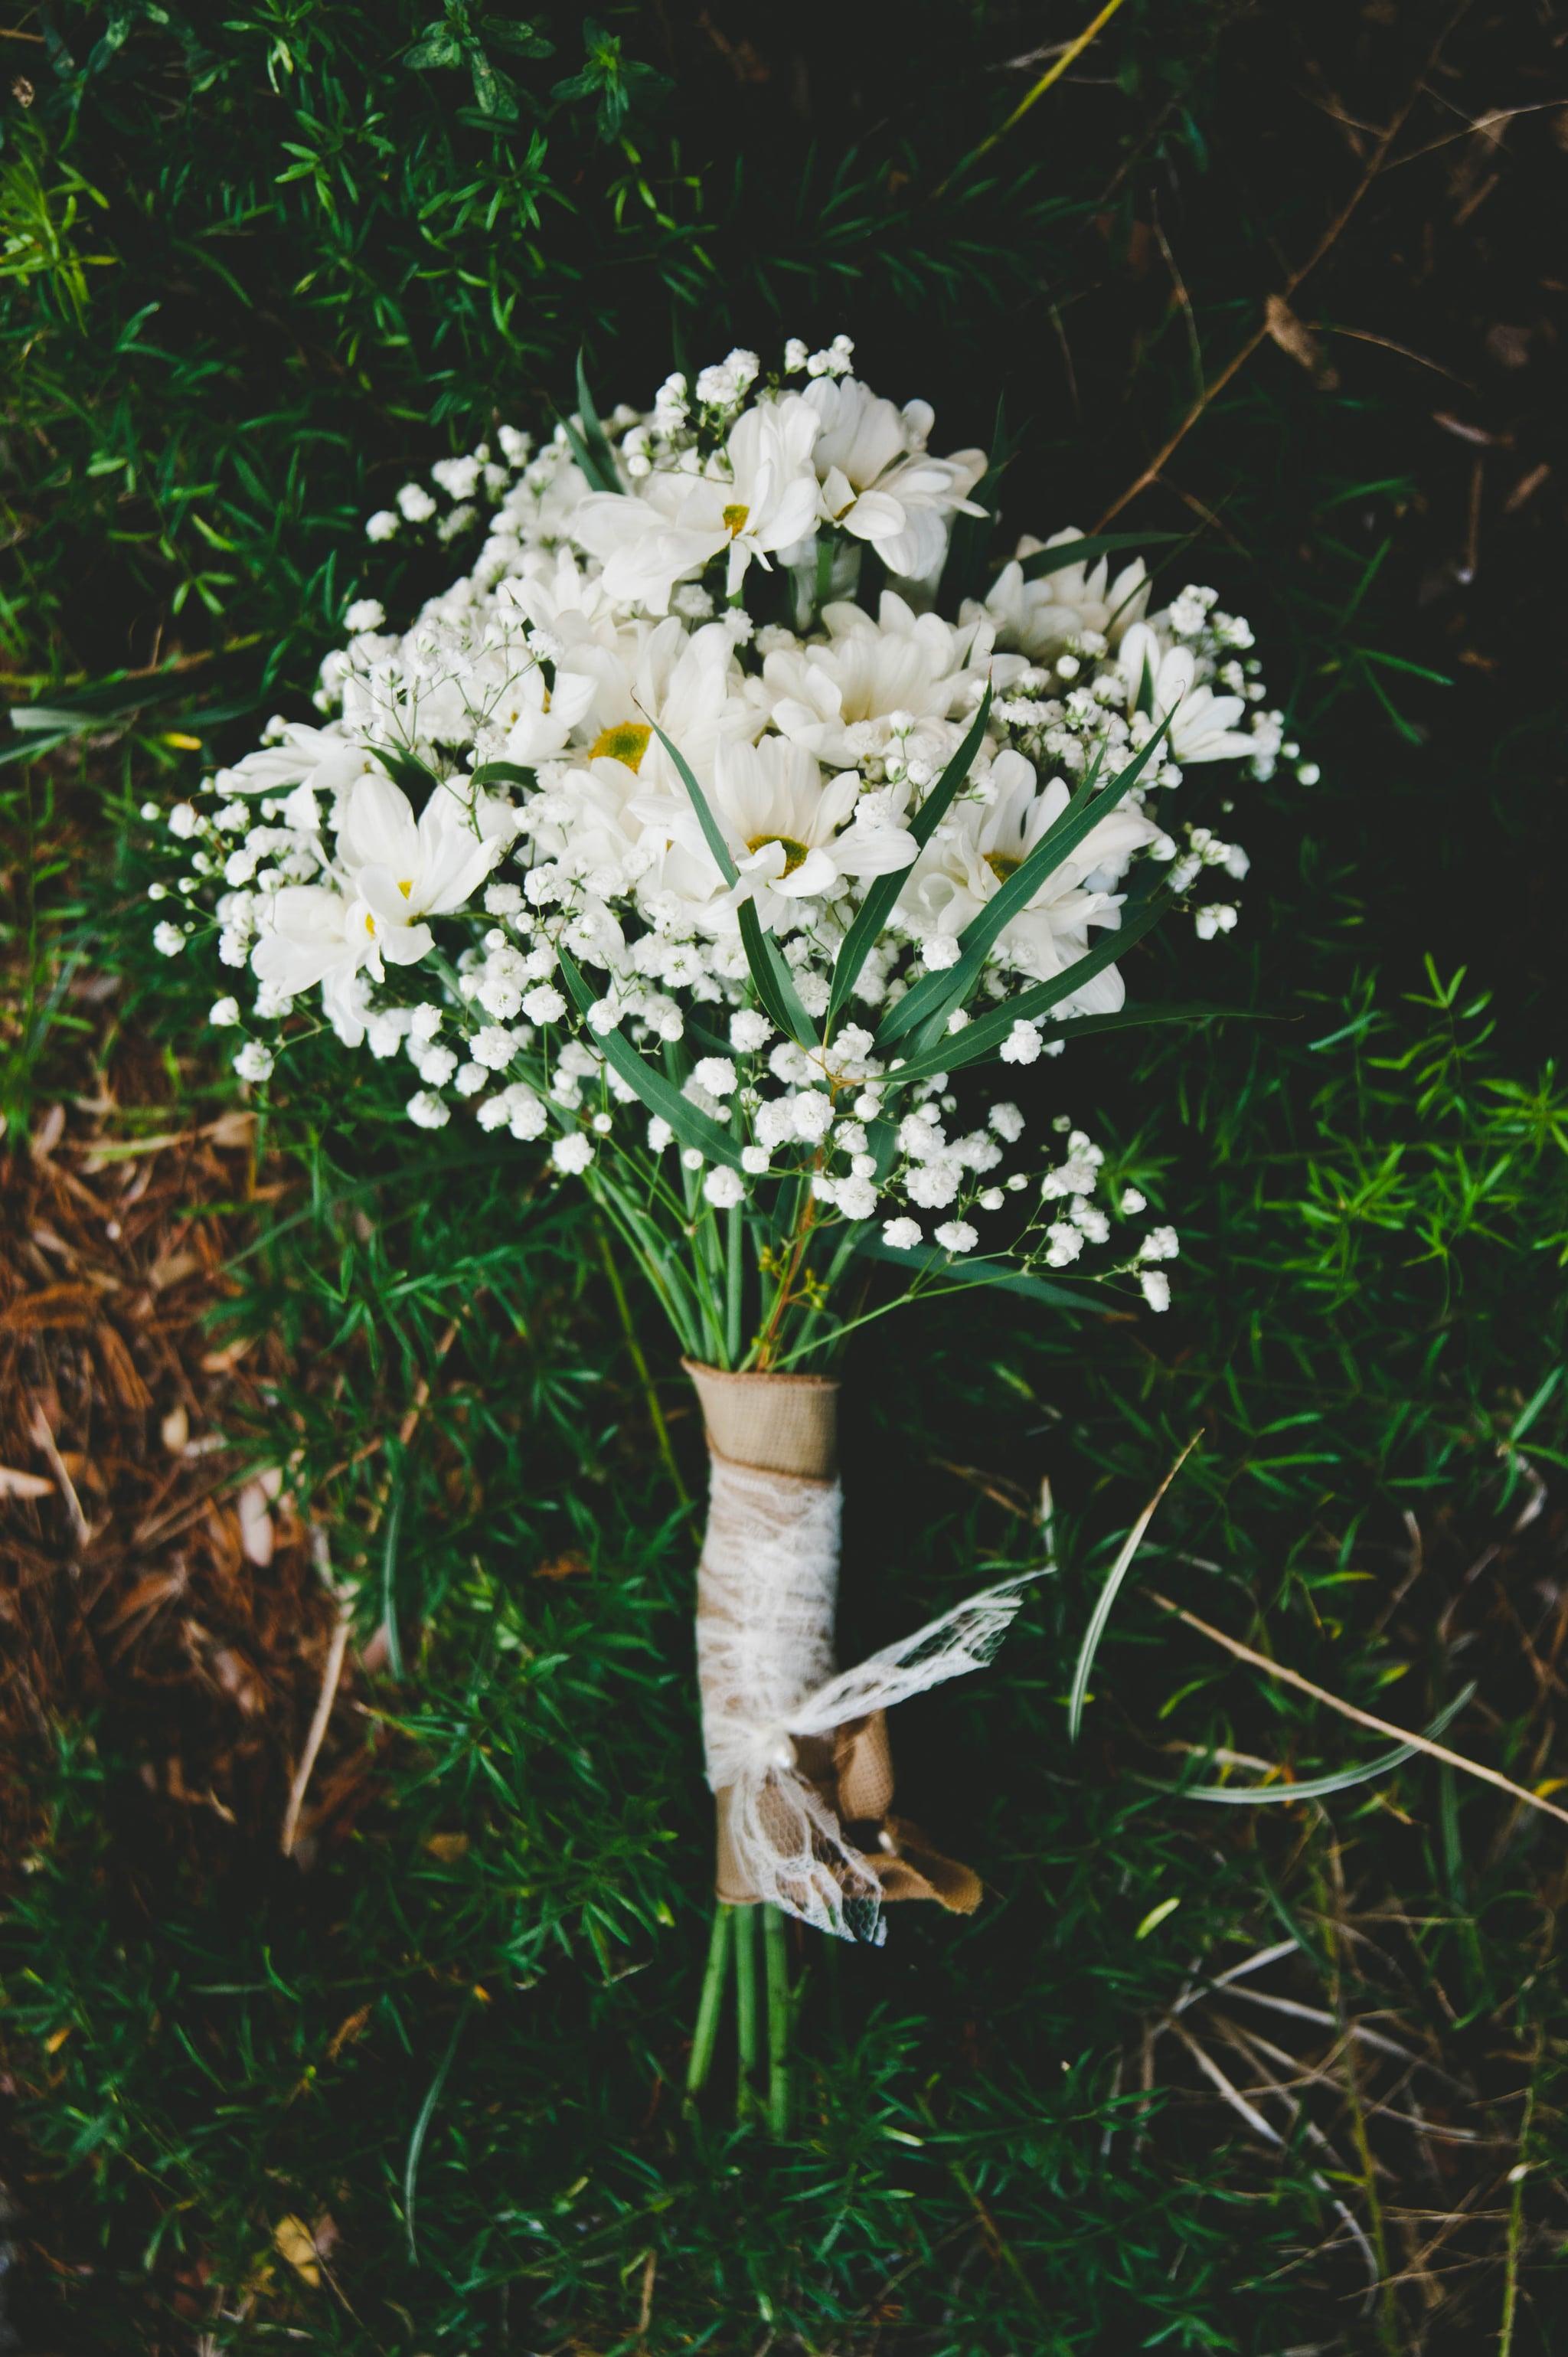 Simple Bridal Bouquet The 6 Best Diy Wedding Ideas Of The Year Popsugar Smart Living Photo 2